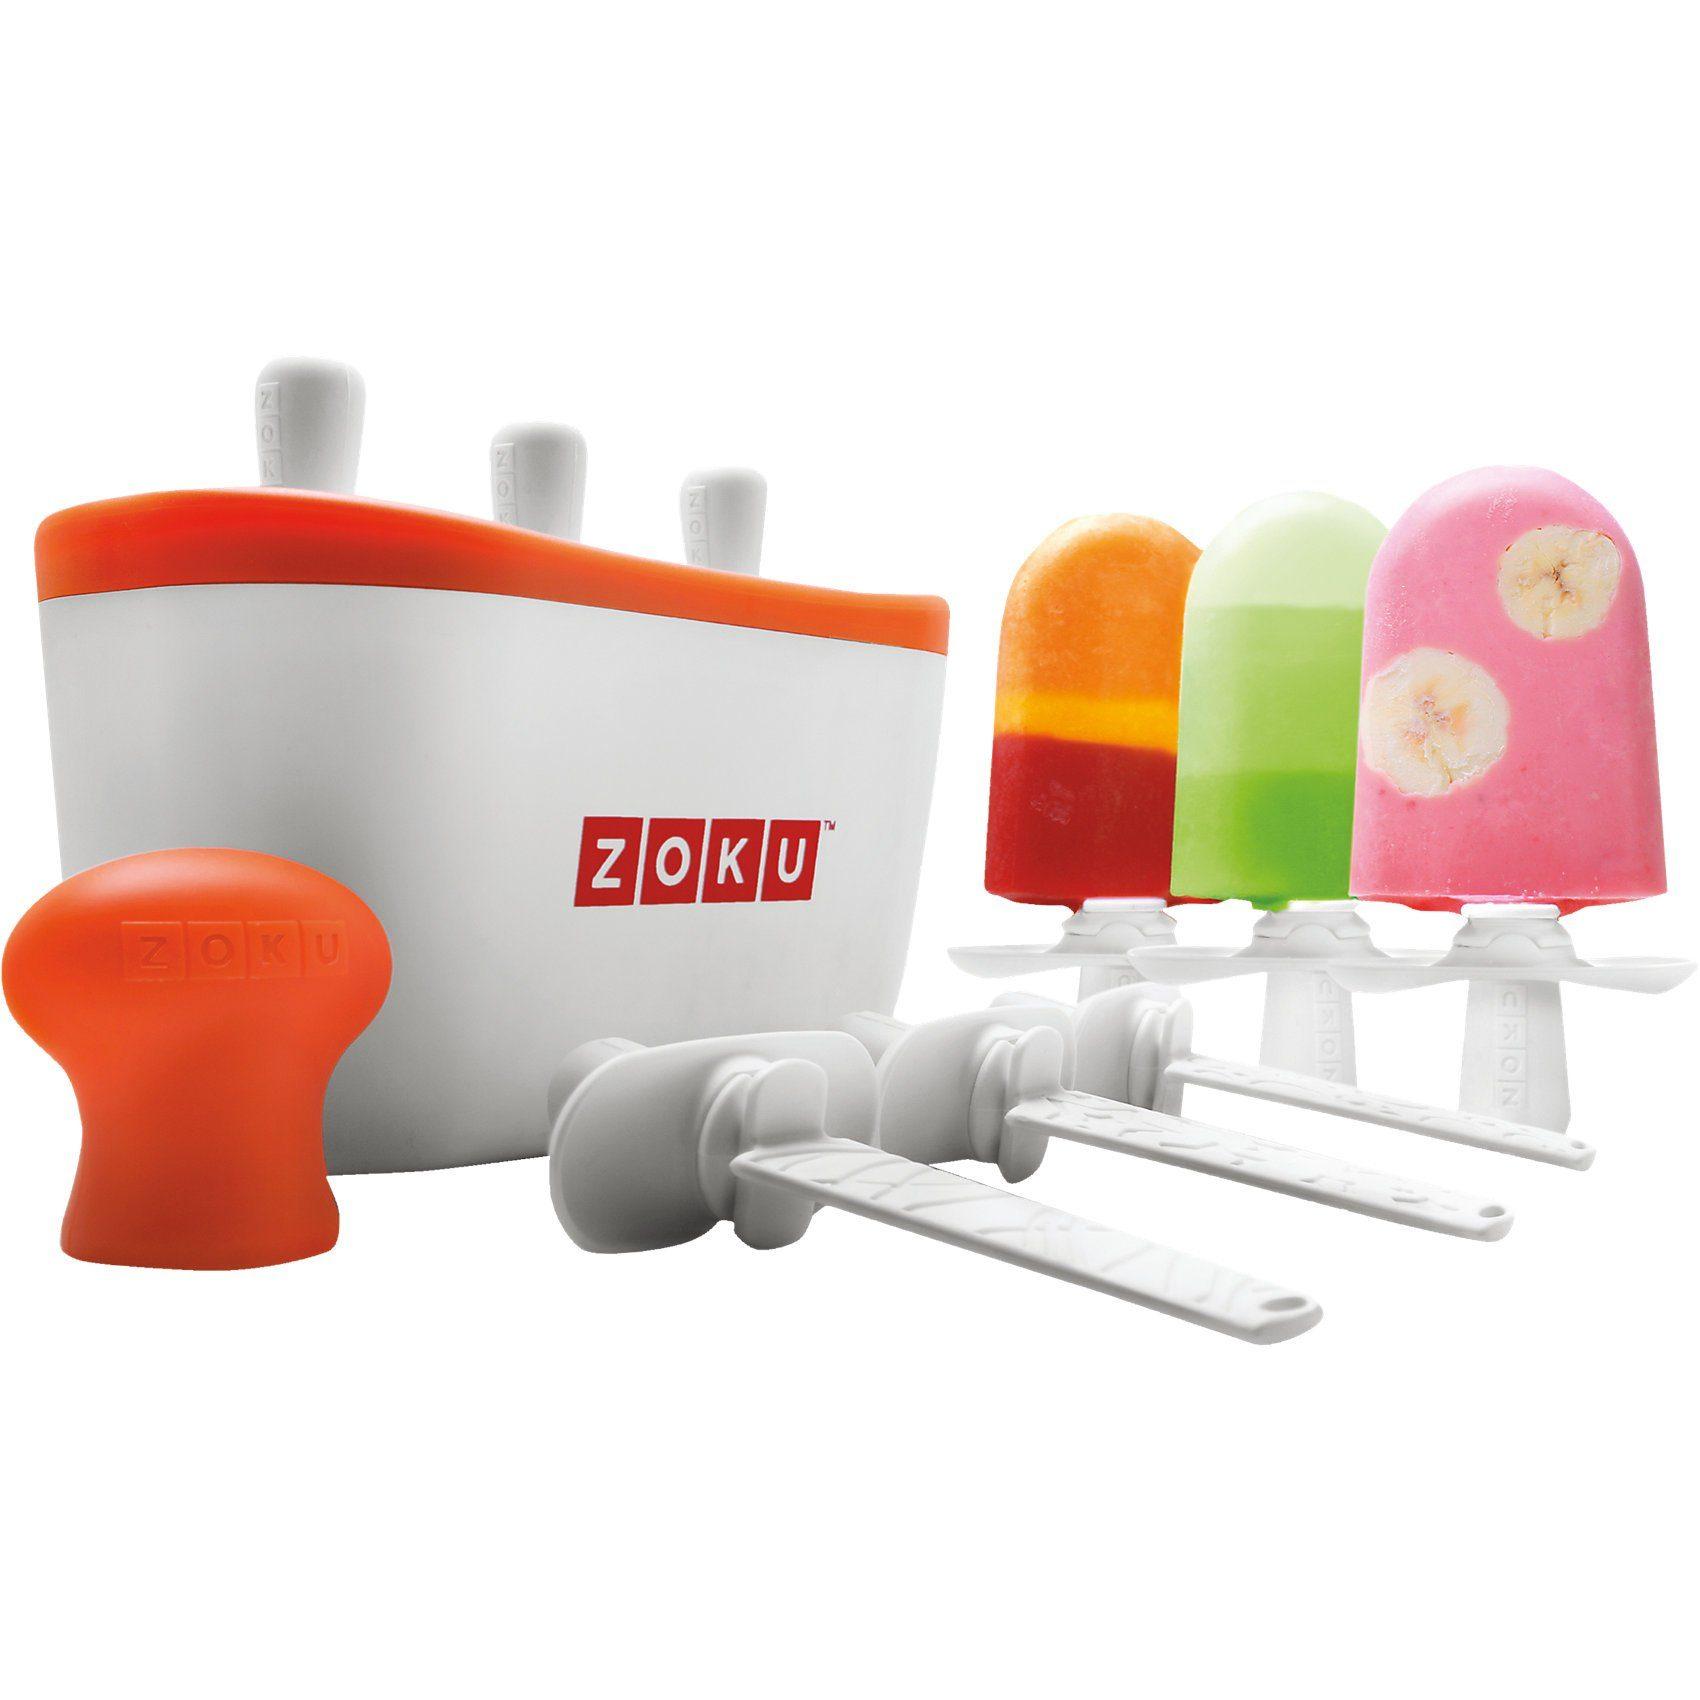 ZOKU Quick Pop Maker 3er Set